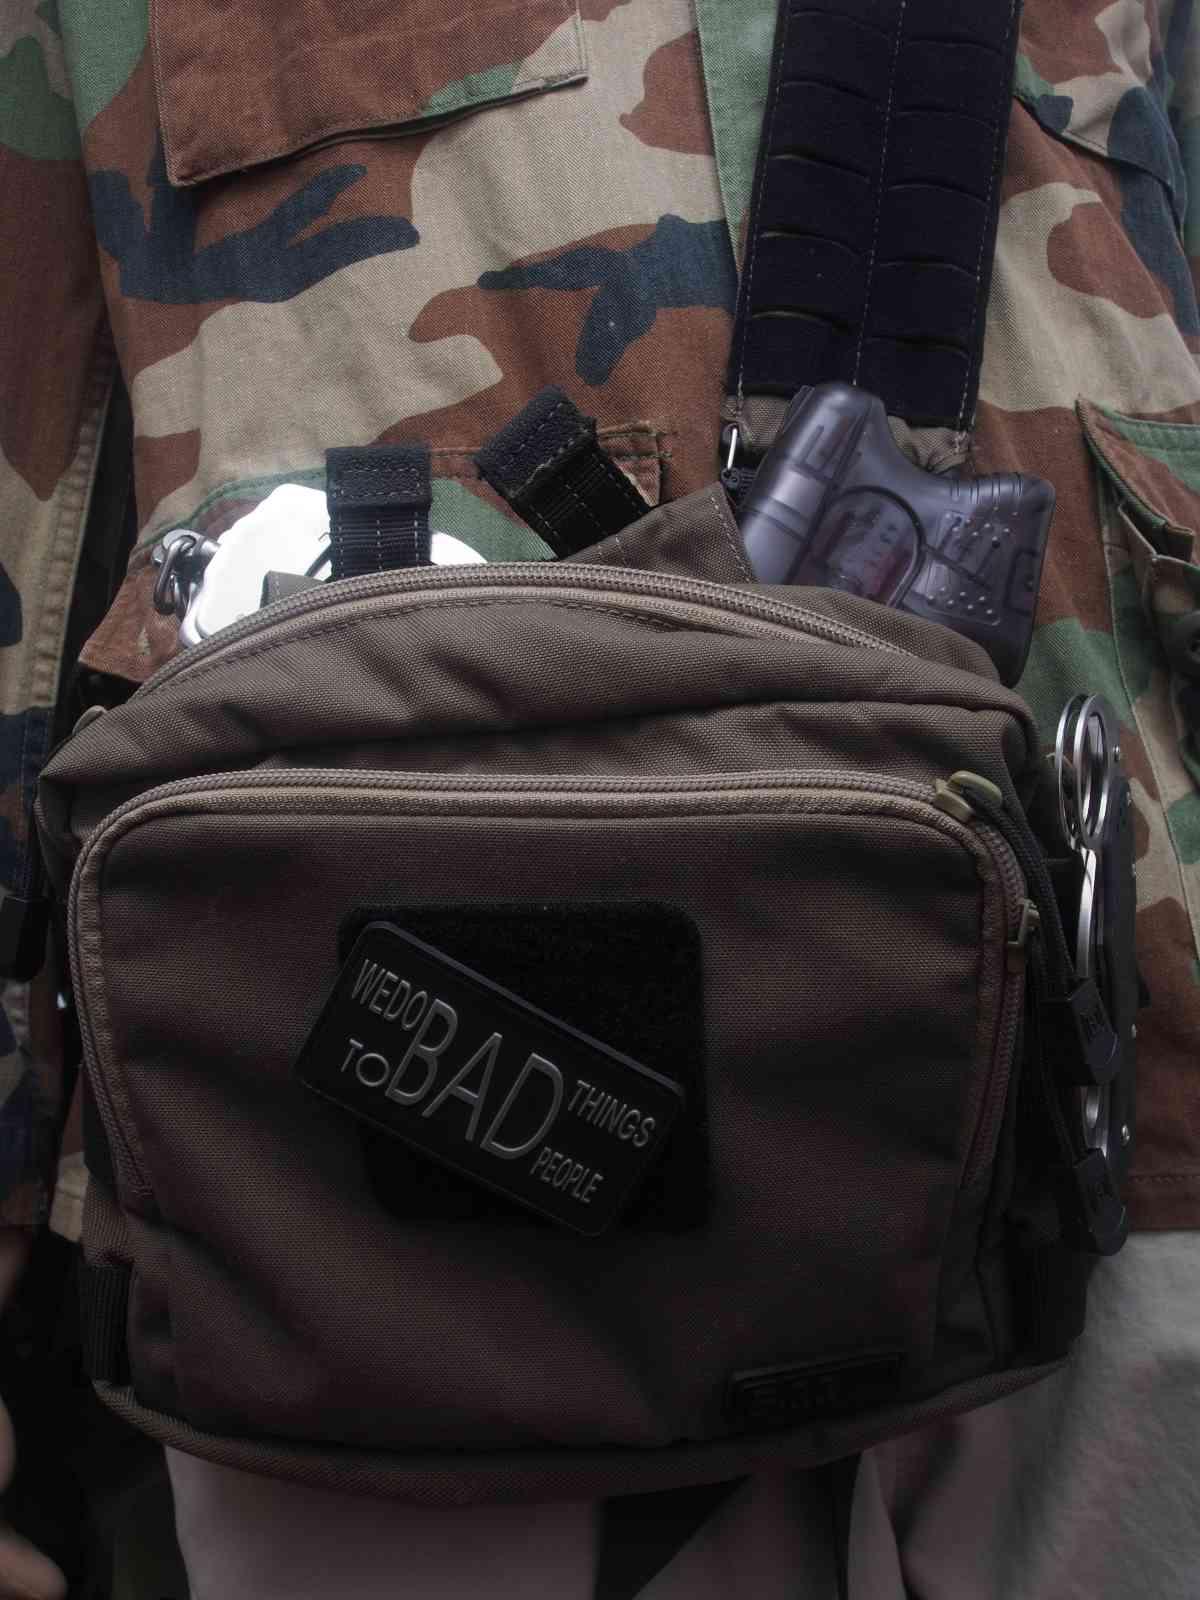 5.11Tactical 2-Banger-Bag